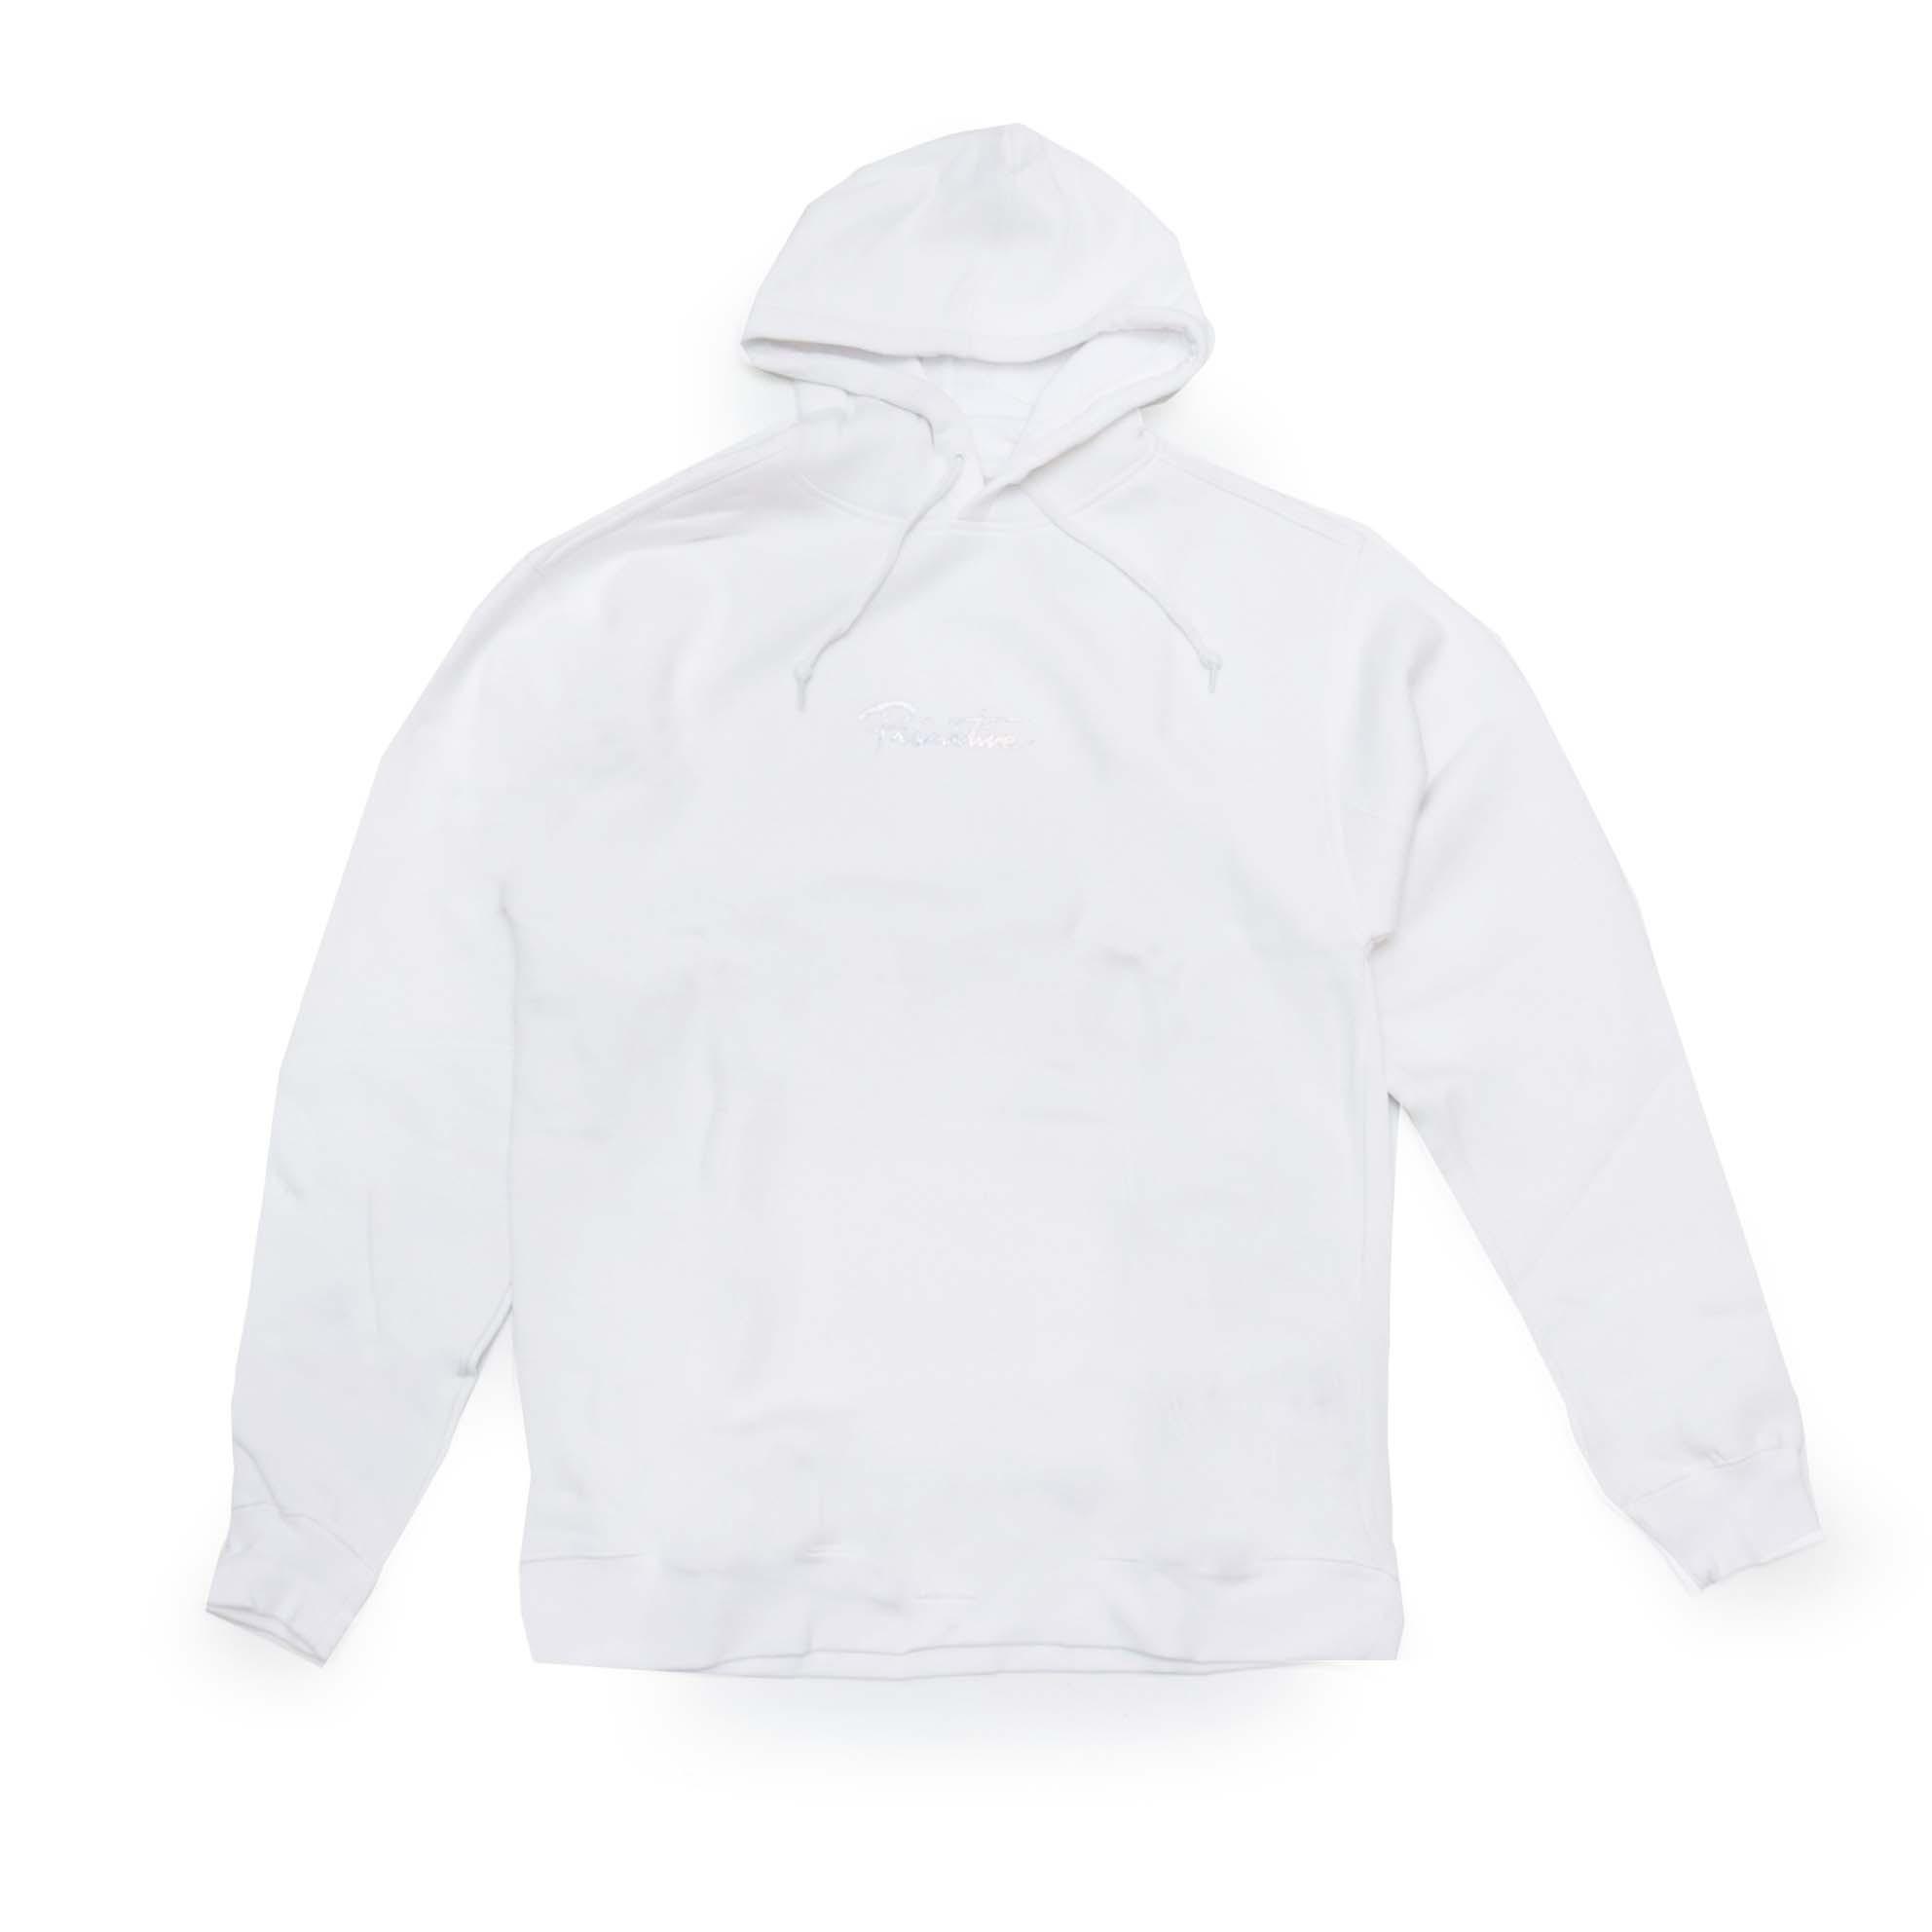 Moletom Primitive Canguru Nuevo Hologram - Branco (Estampa Holográfica/Importado)